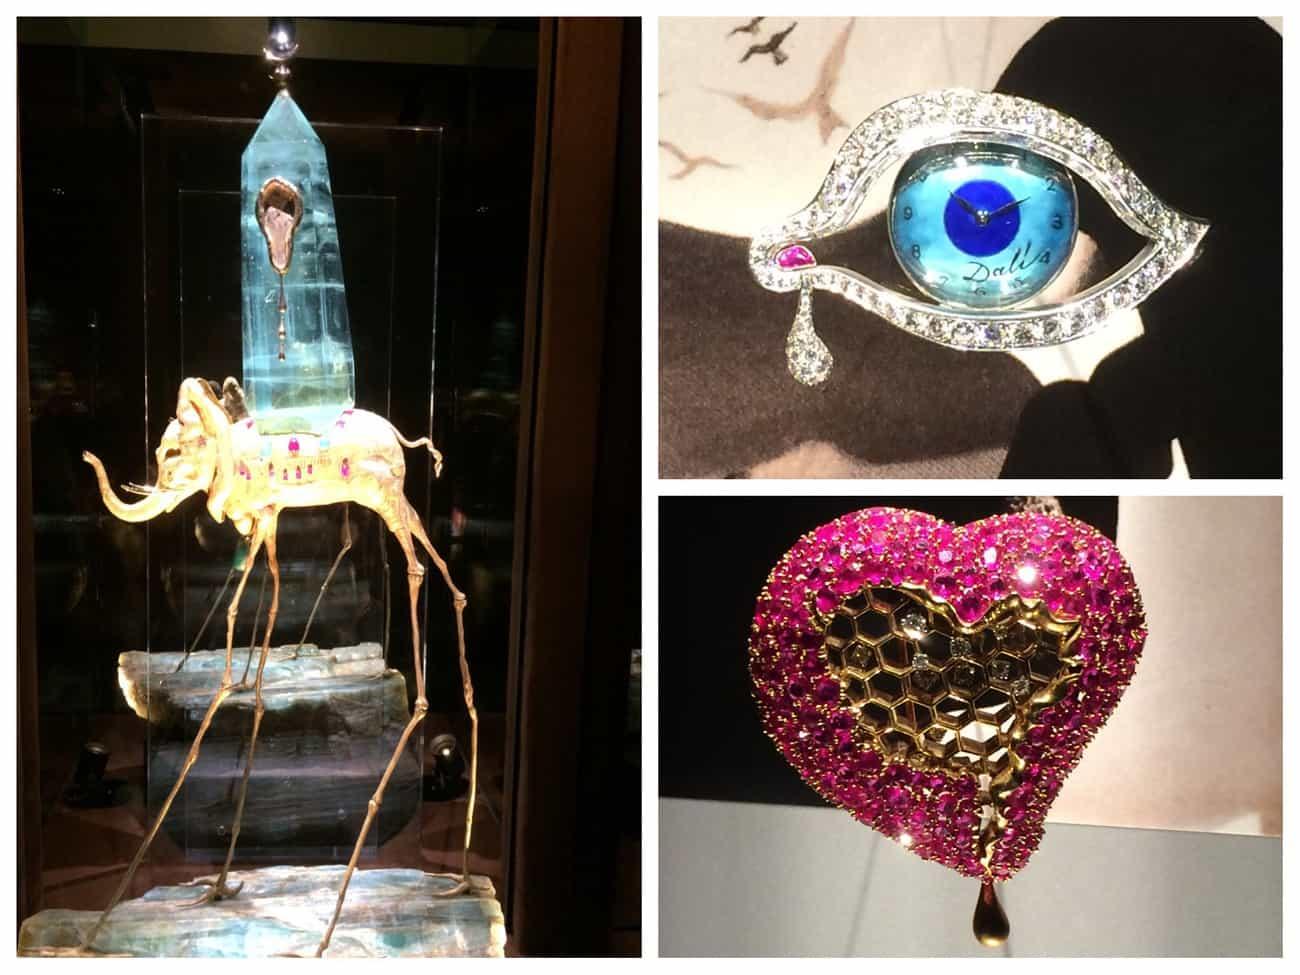 Dali Theatre Museum - Jewellery